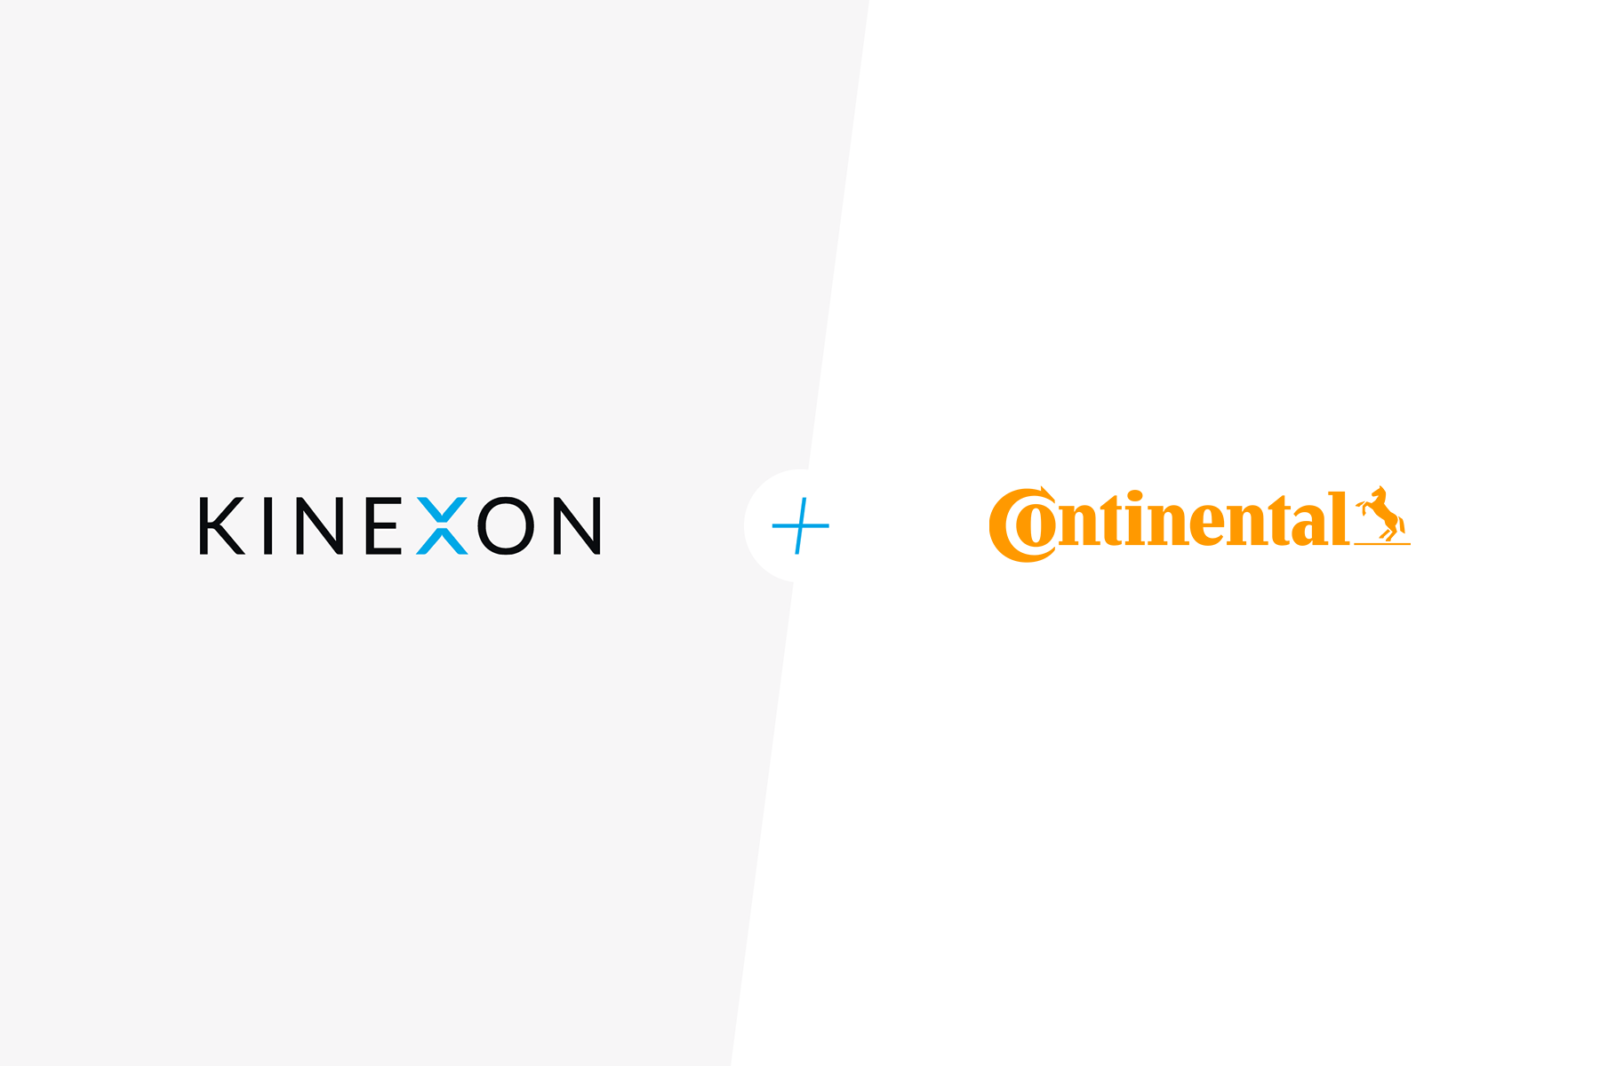 KINEXON Indsutries Partner Post Continental